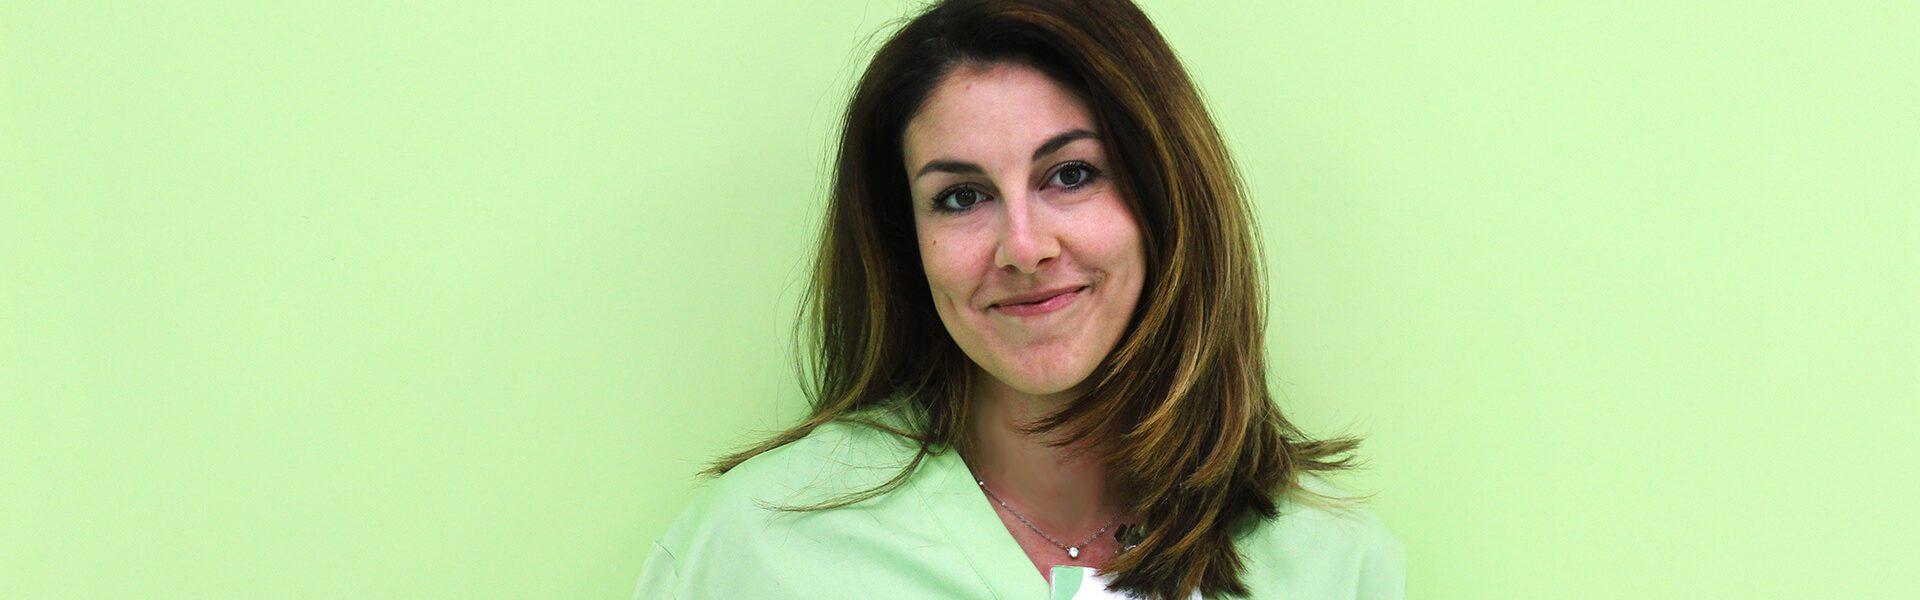 Eleonora Fiore, Neuropsicomotricista